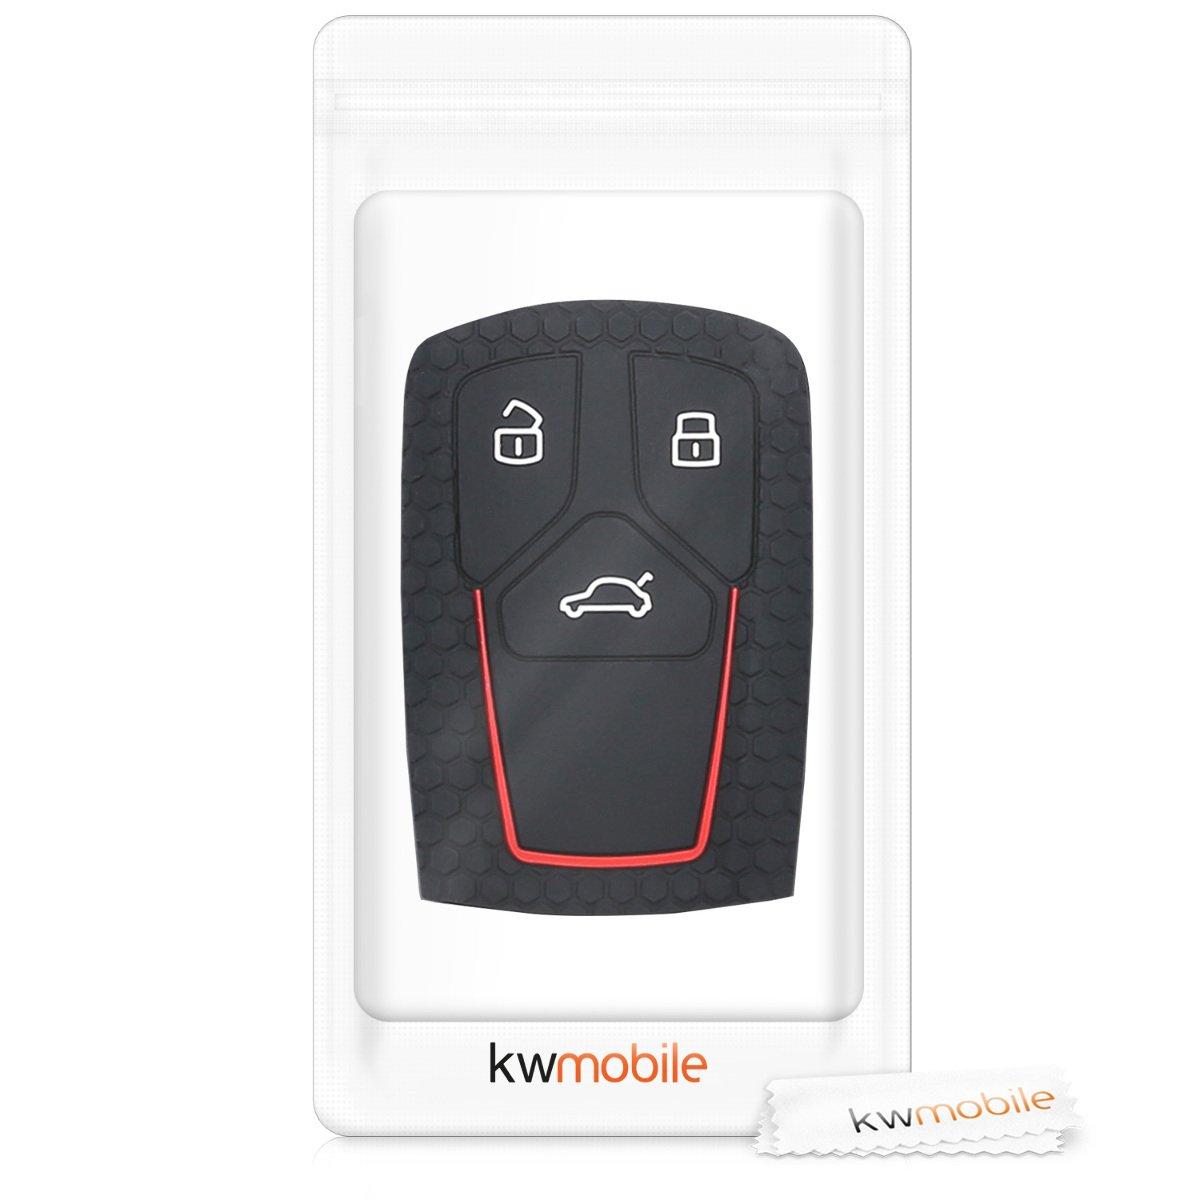 kwmobile Funda para Llave Smartkey de 3 Botones para Coche Audi Solamente Keyless Go de Silicona - Case de Mando de Auto con dise/ño Deportivo - Carcasa Protectora Suave